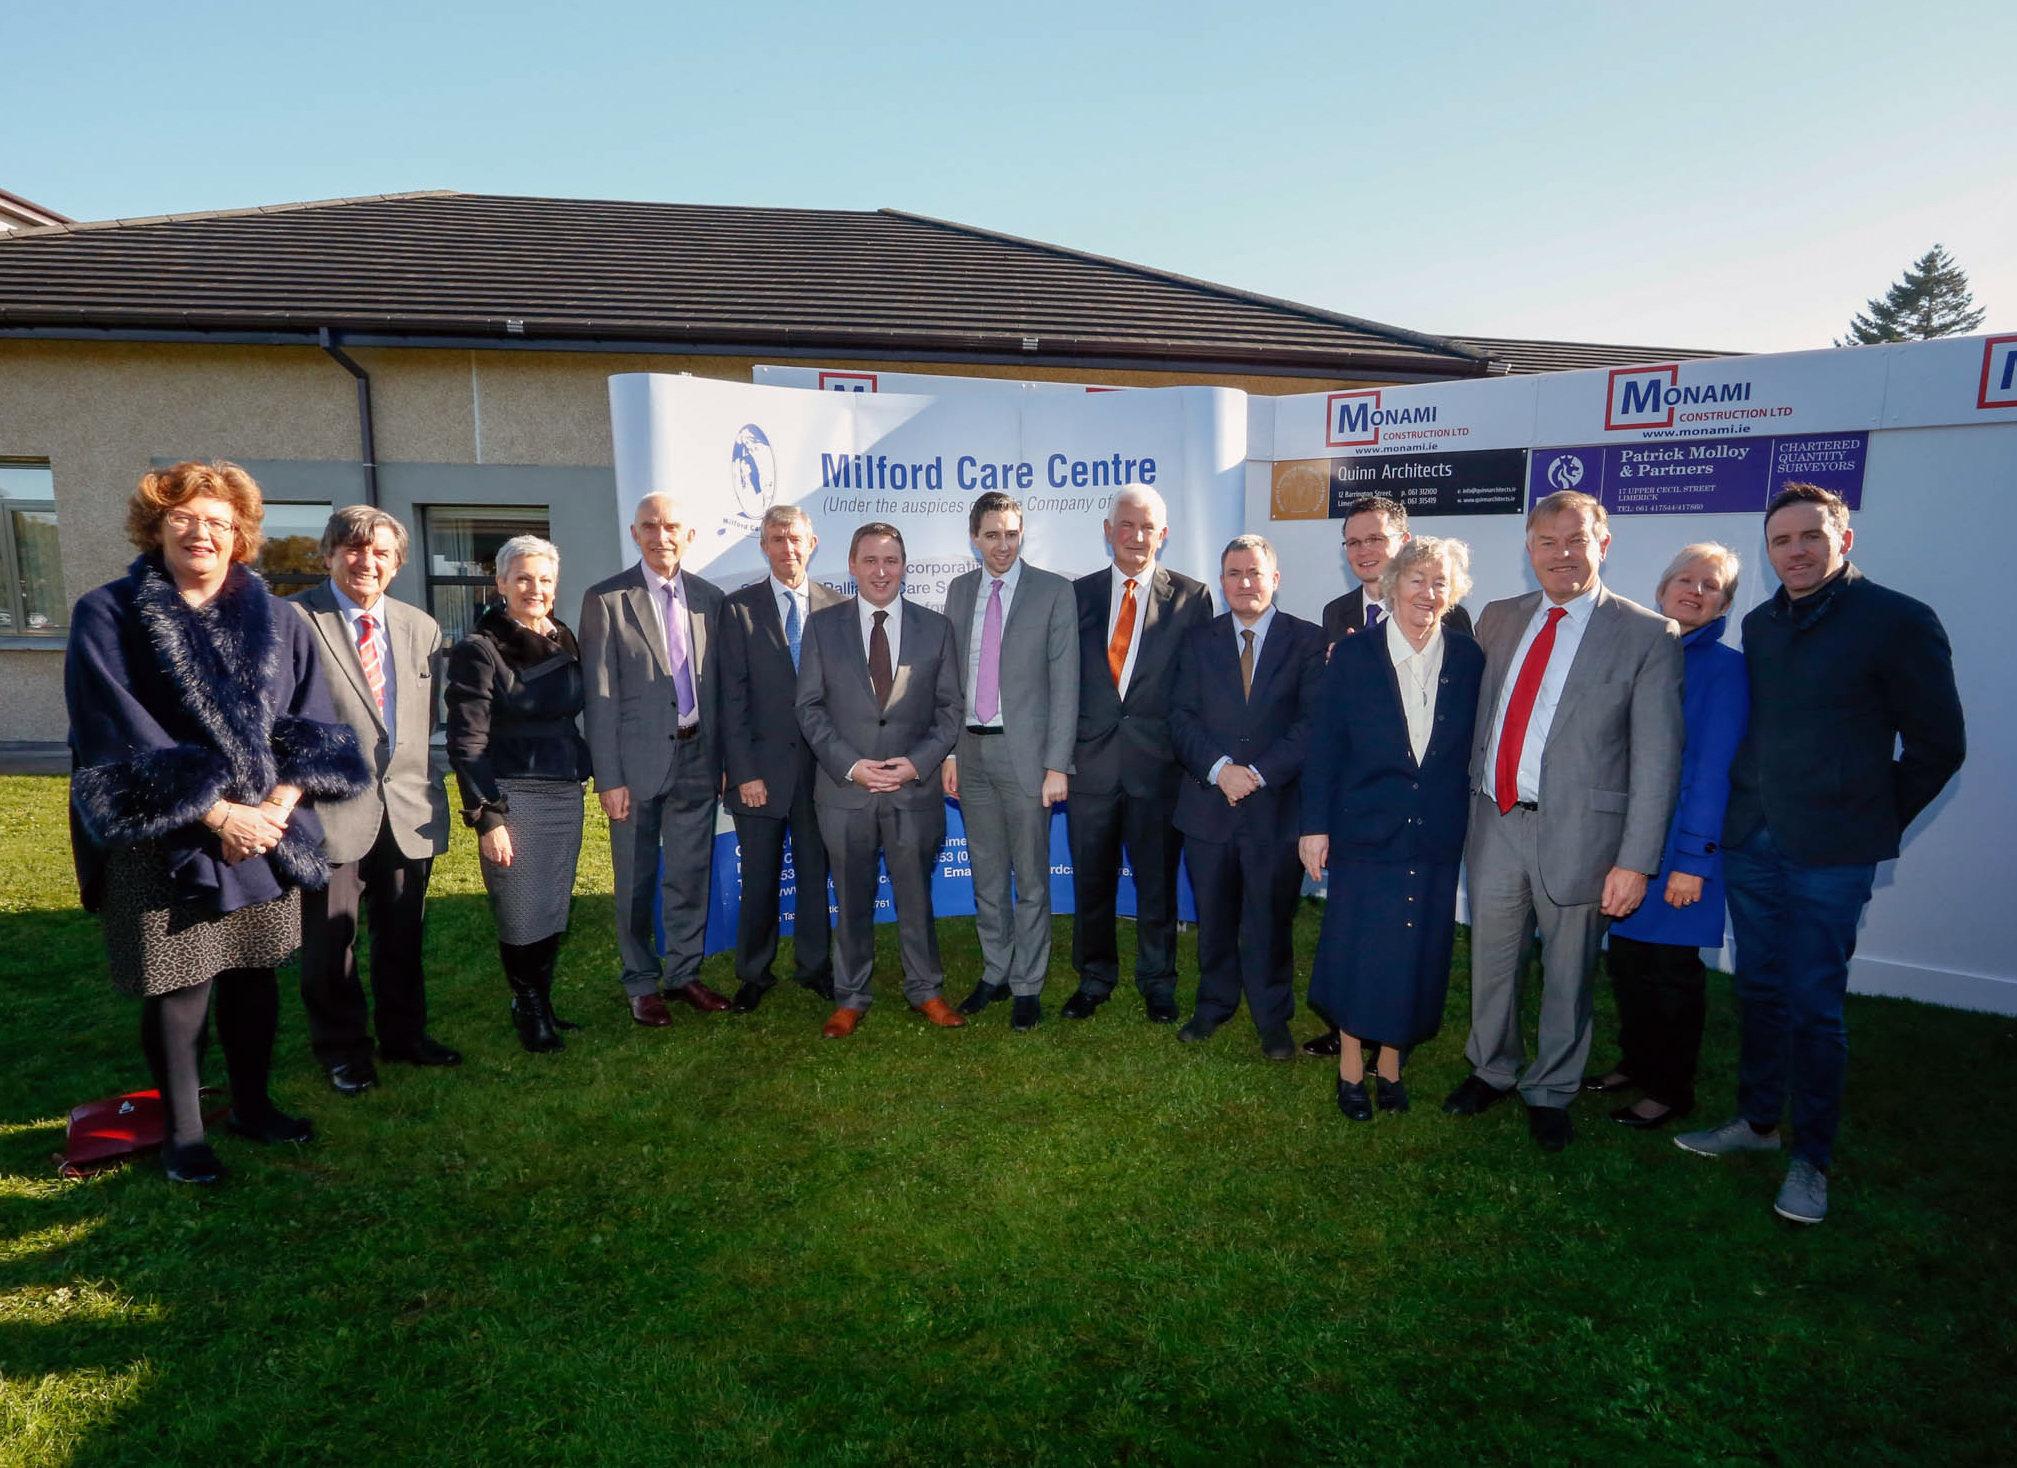 Simon Harris launches Milford Care Centre project